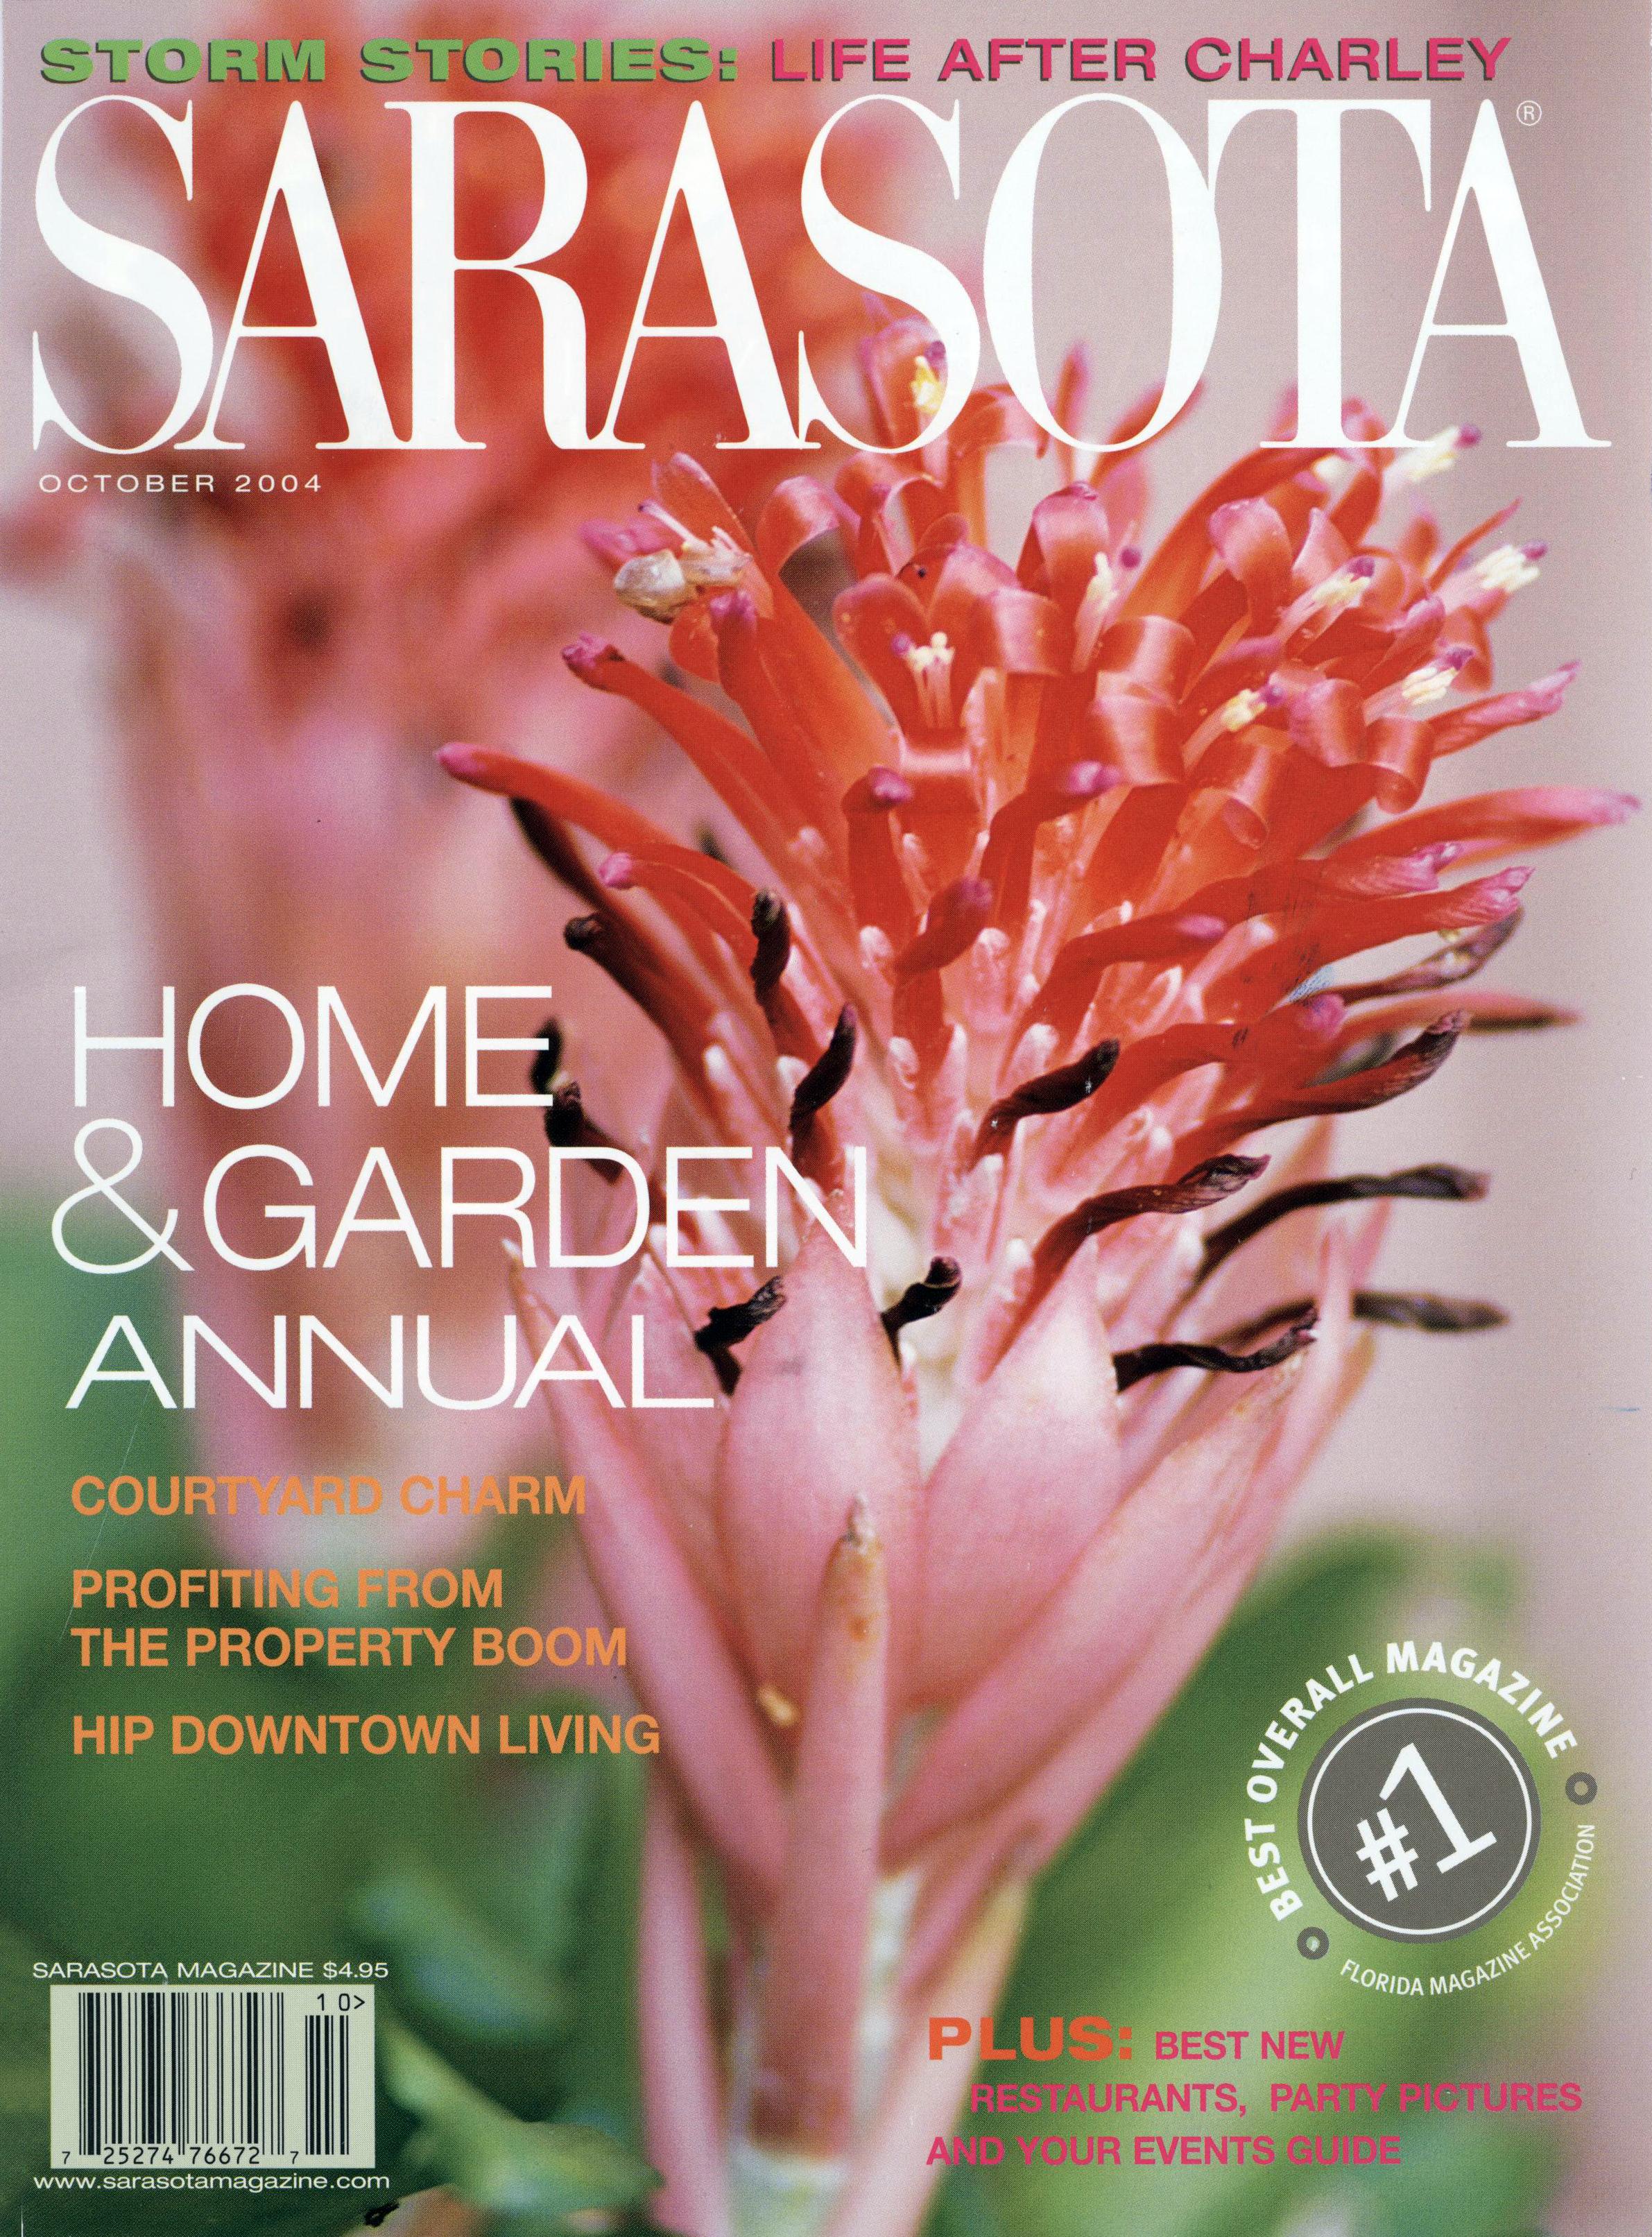 Sarasota 2004 (Publications) 001 SC-7.jpg